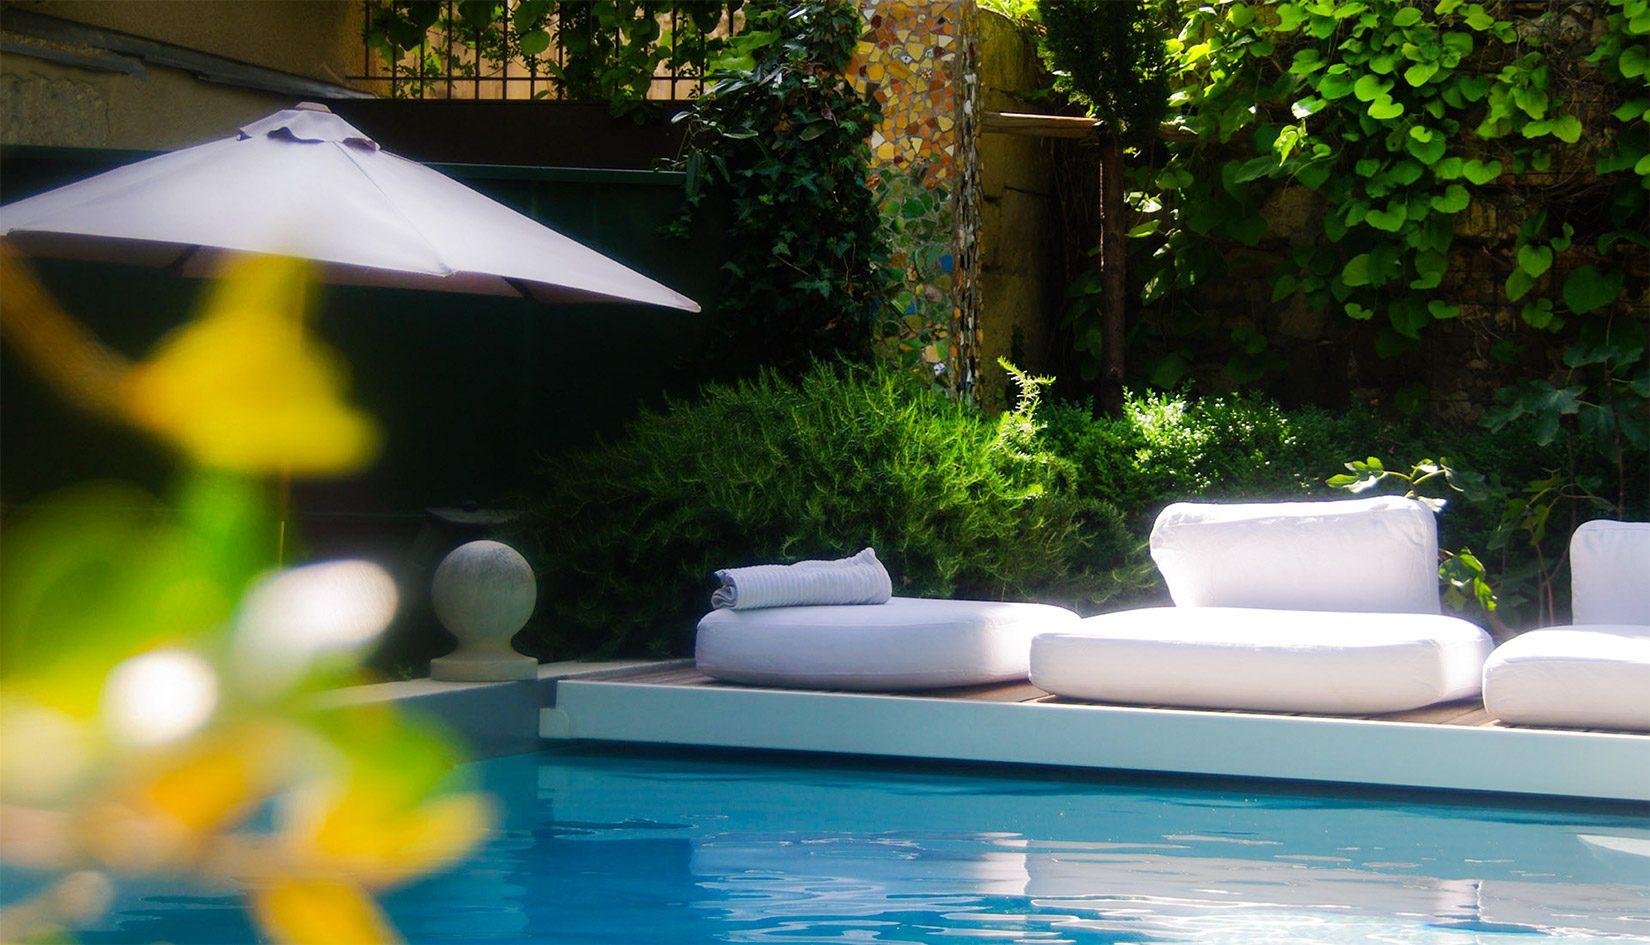 Les Jardins De Baracane Chambres D Hotes De Charme A Avignon En